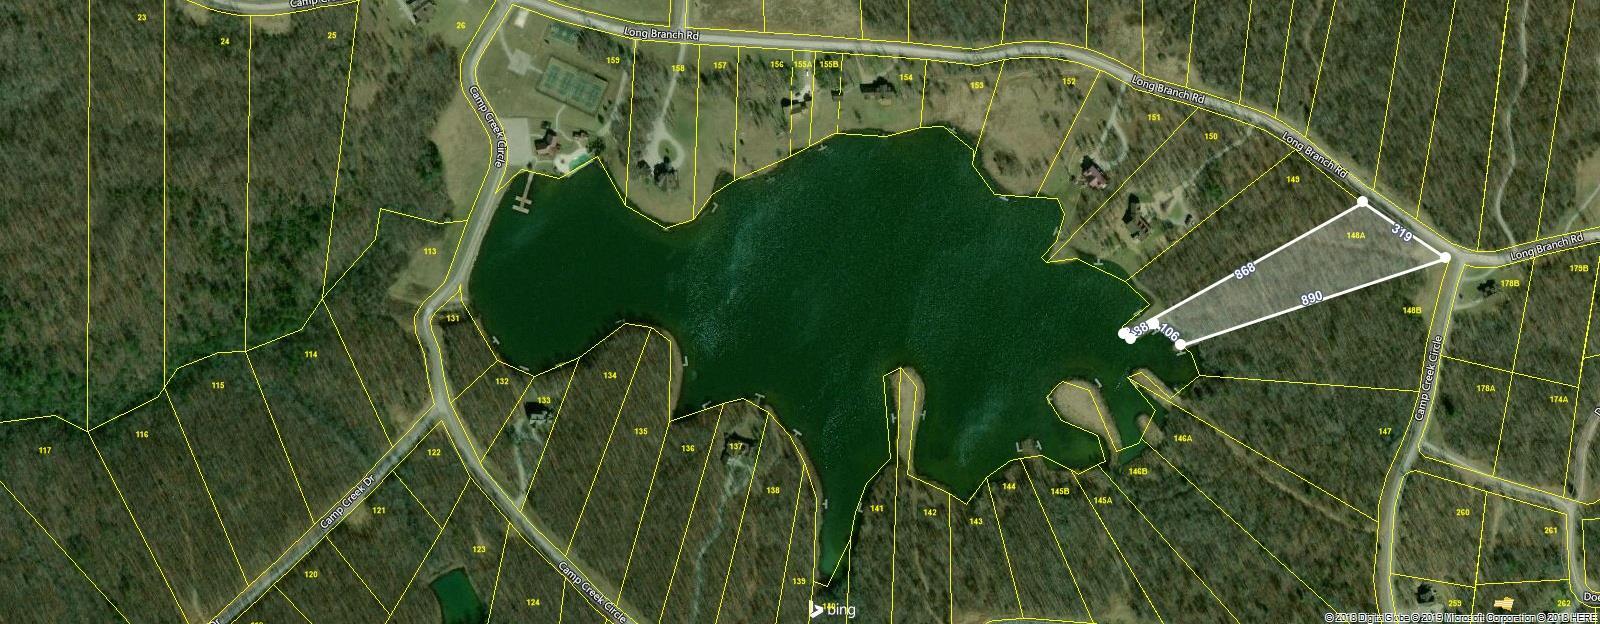 0 Long Branch Rd 148A, Spencer, TN 38585 - Spencer, TN real estate listing